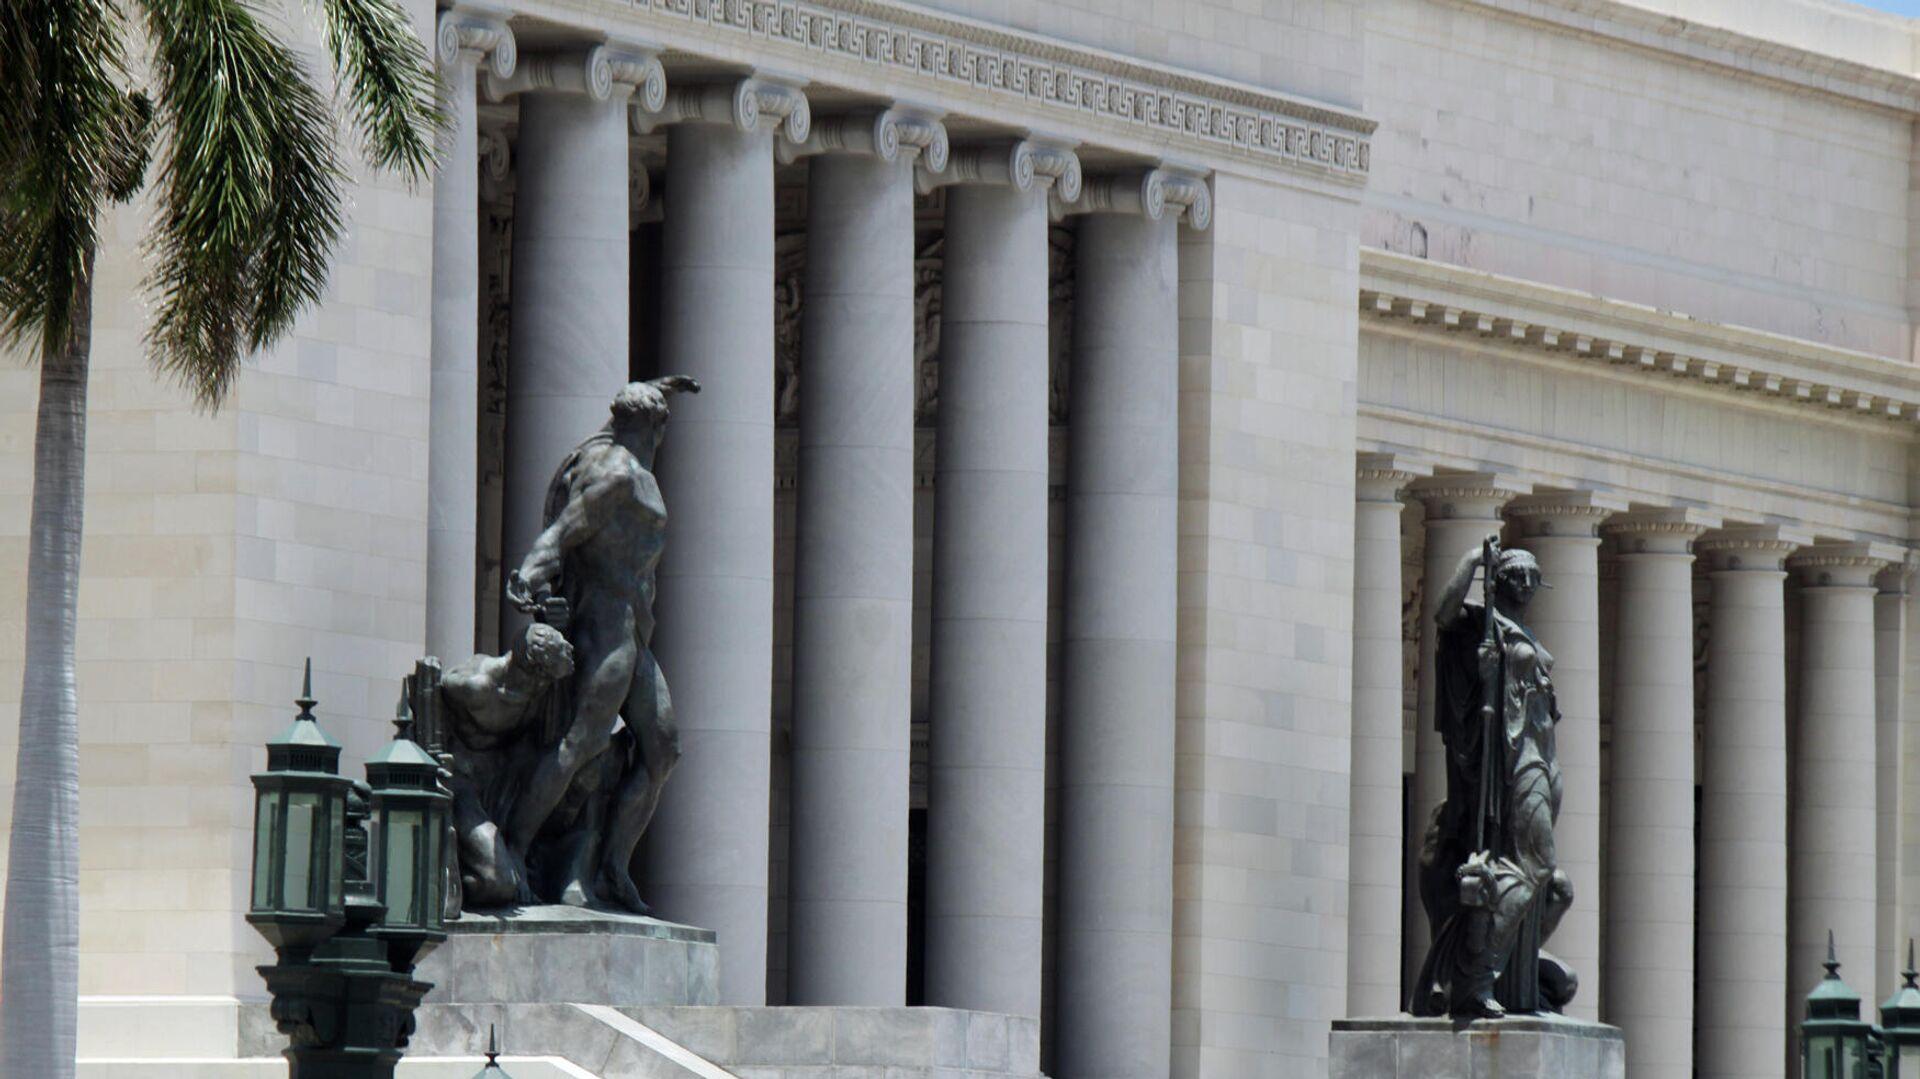 Estatuas en la entrada del Capitolio de La Habana - Sputnik Mundo, 1920, 11.05.2021